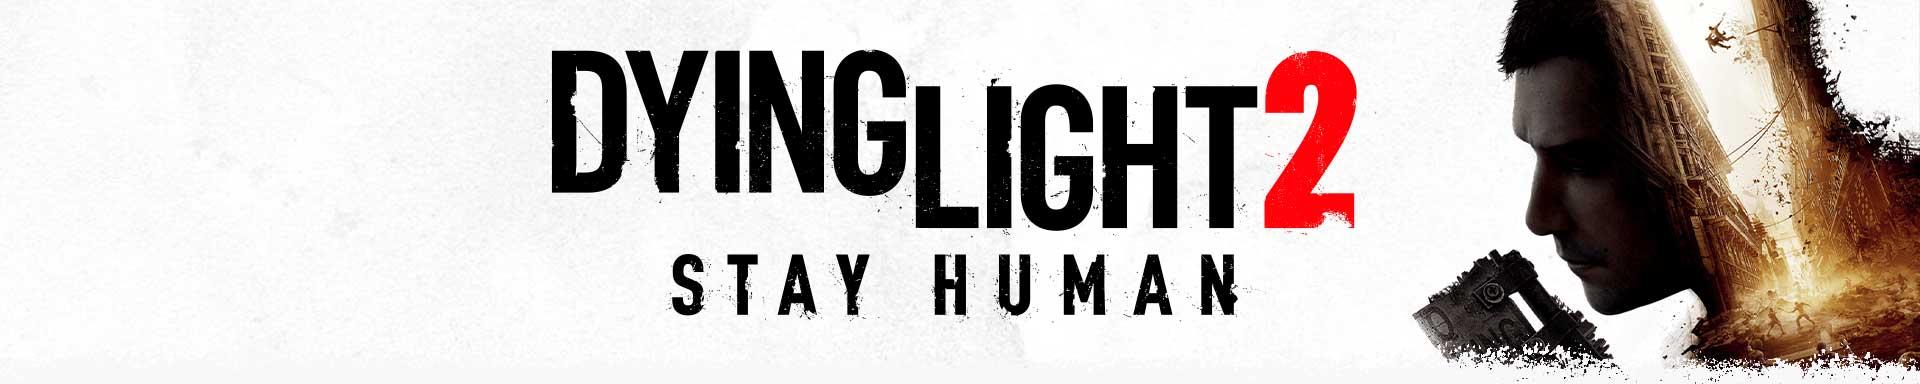 dying light 2 background kat